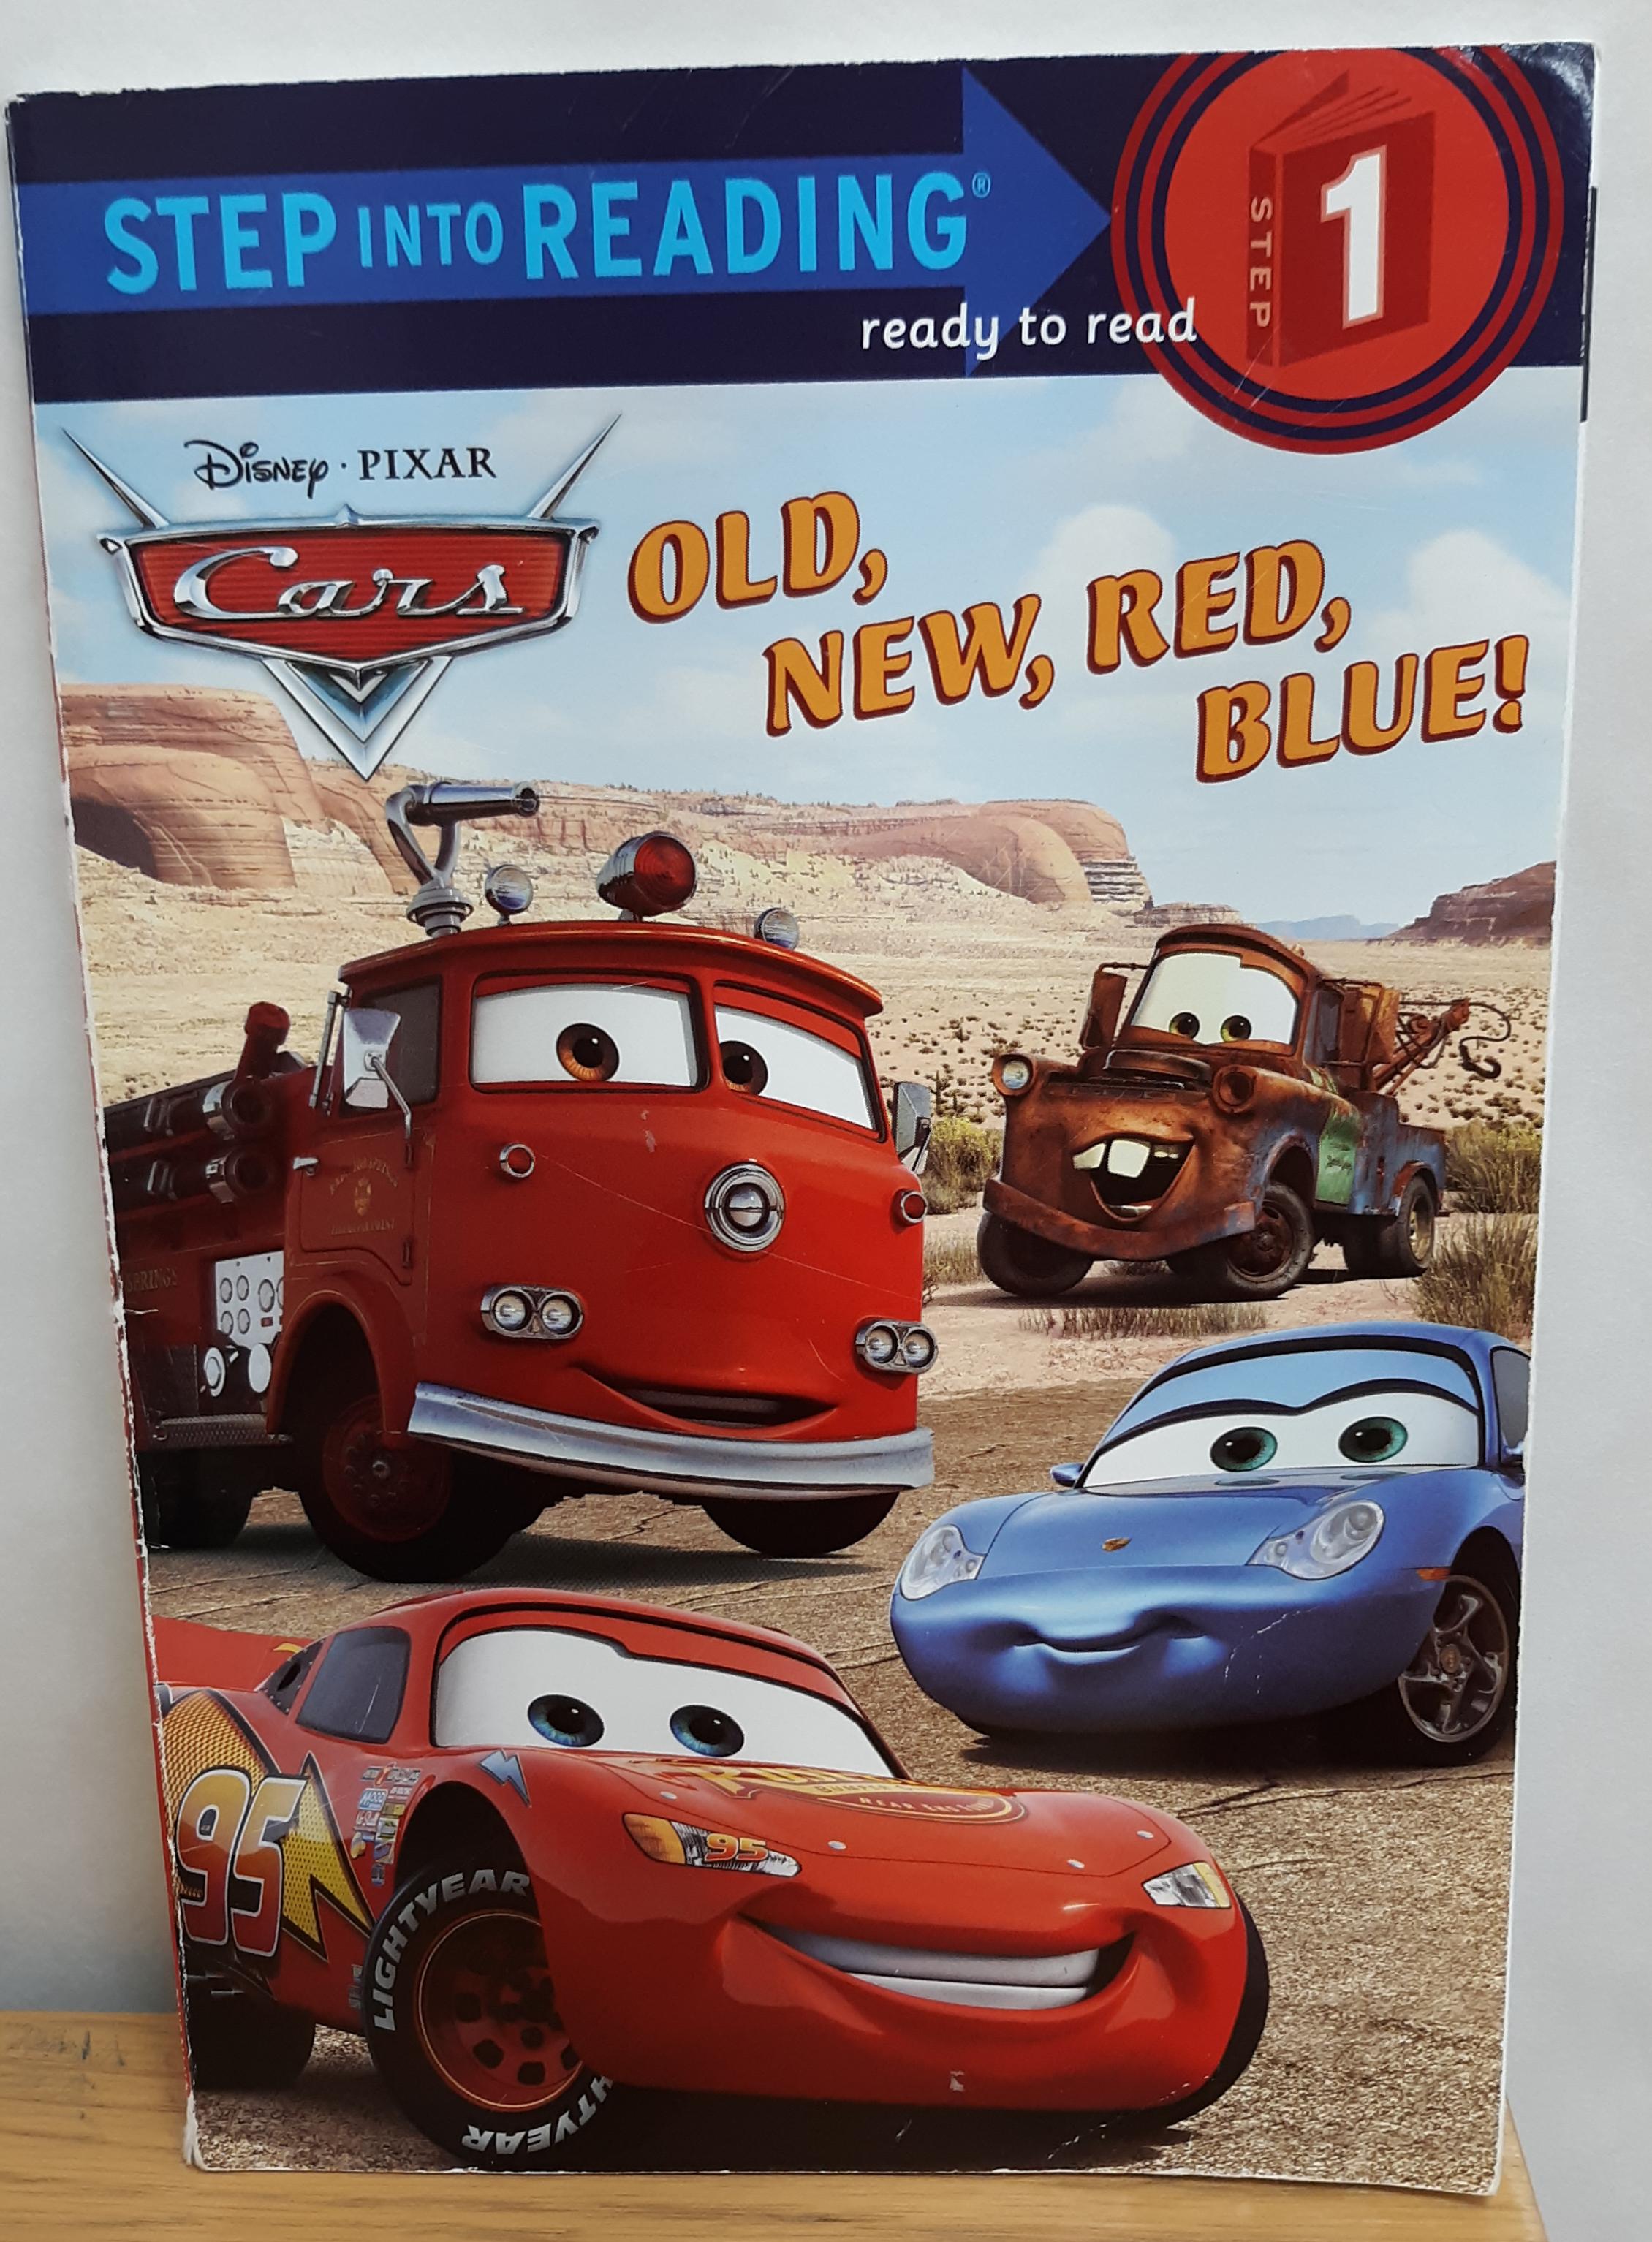 https://0201.nccdn.net/1_2/000/000/143/259/cars--old--new--red--blue.png